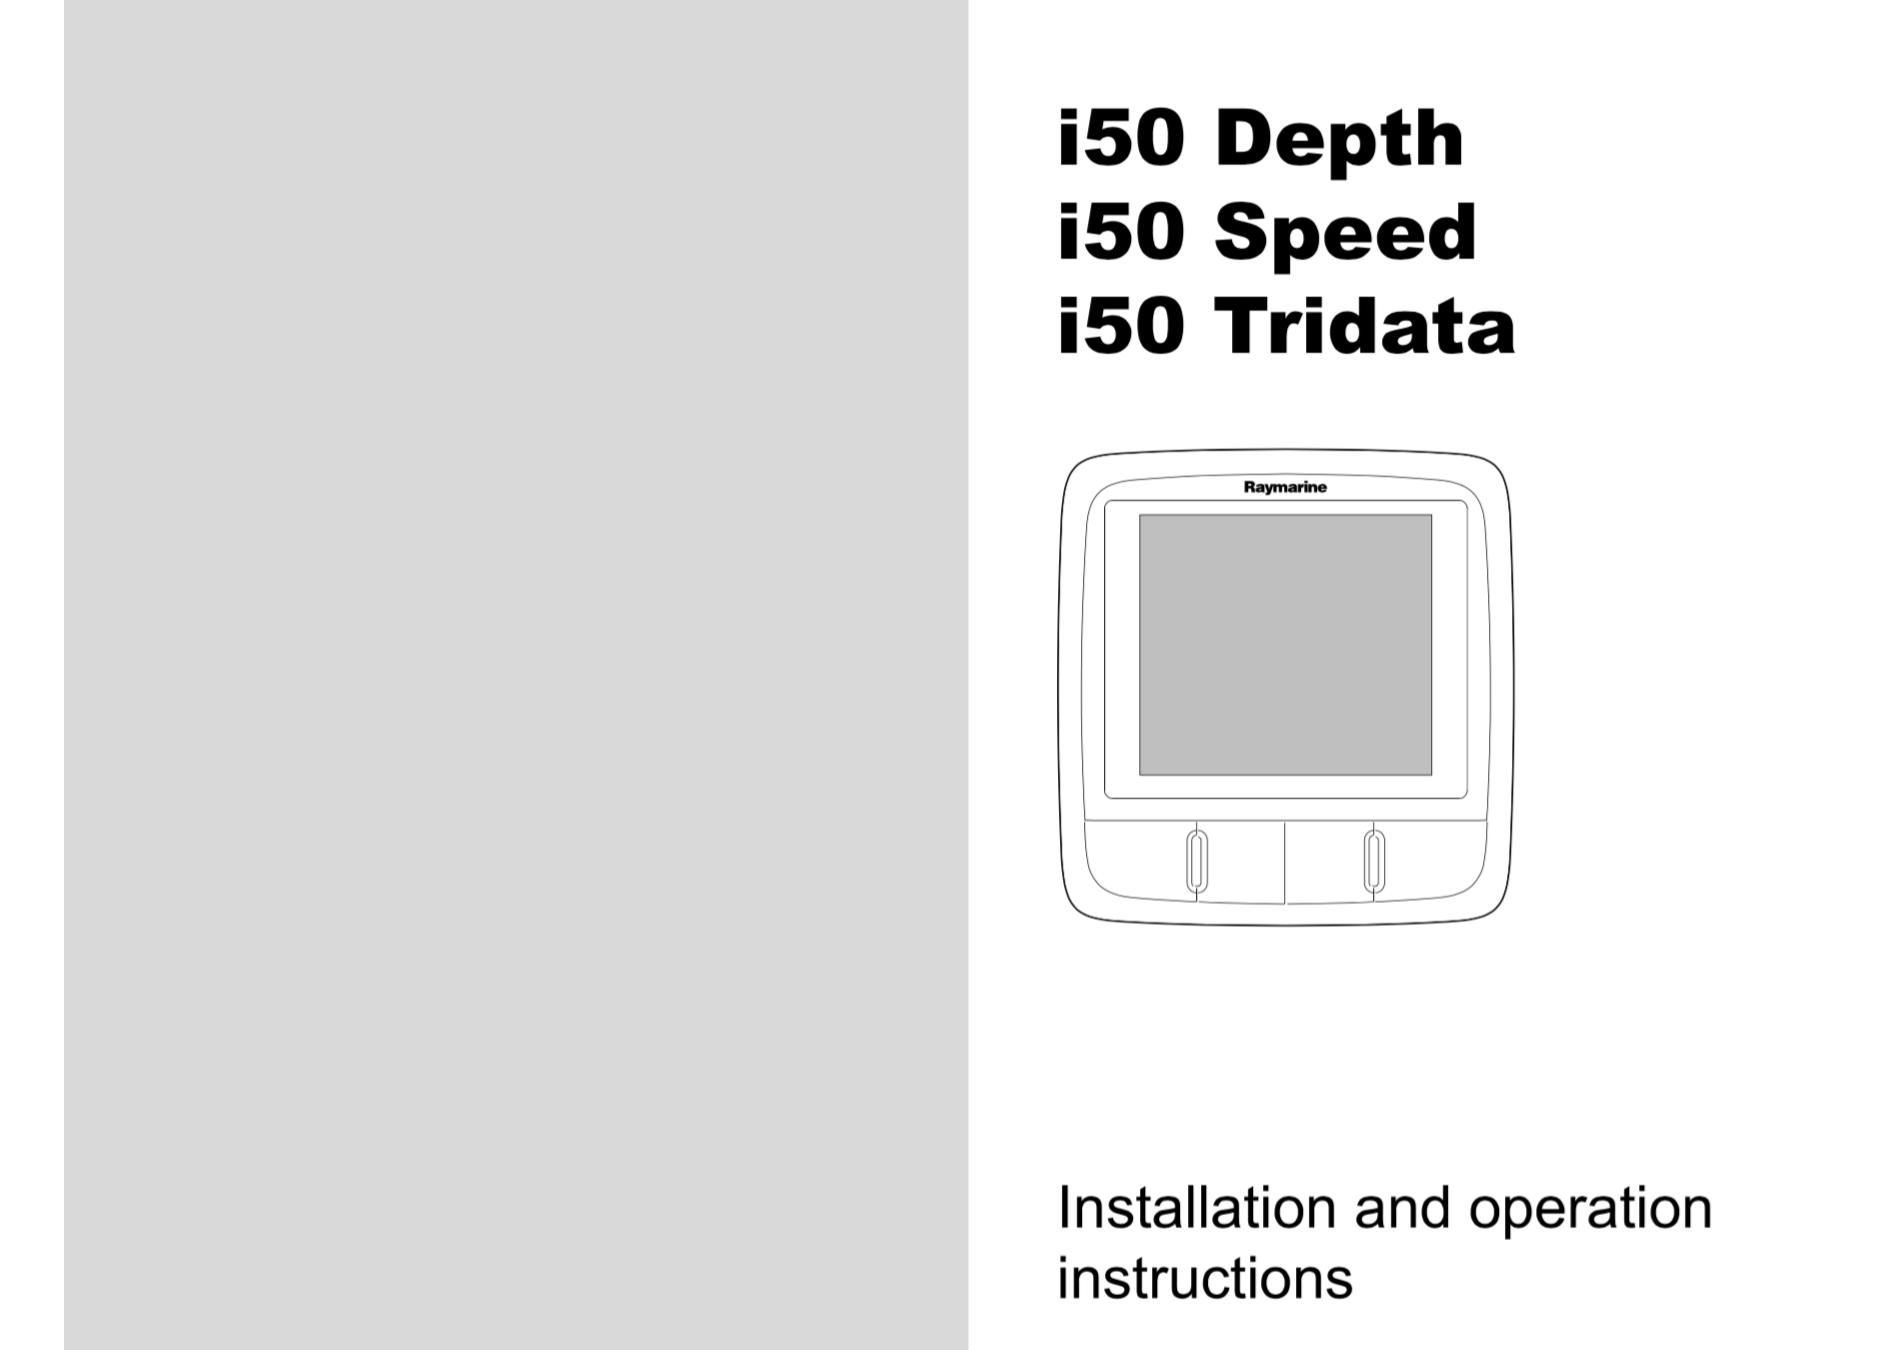 i50 instruments installation operation instructions